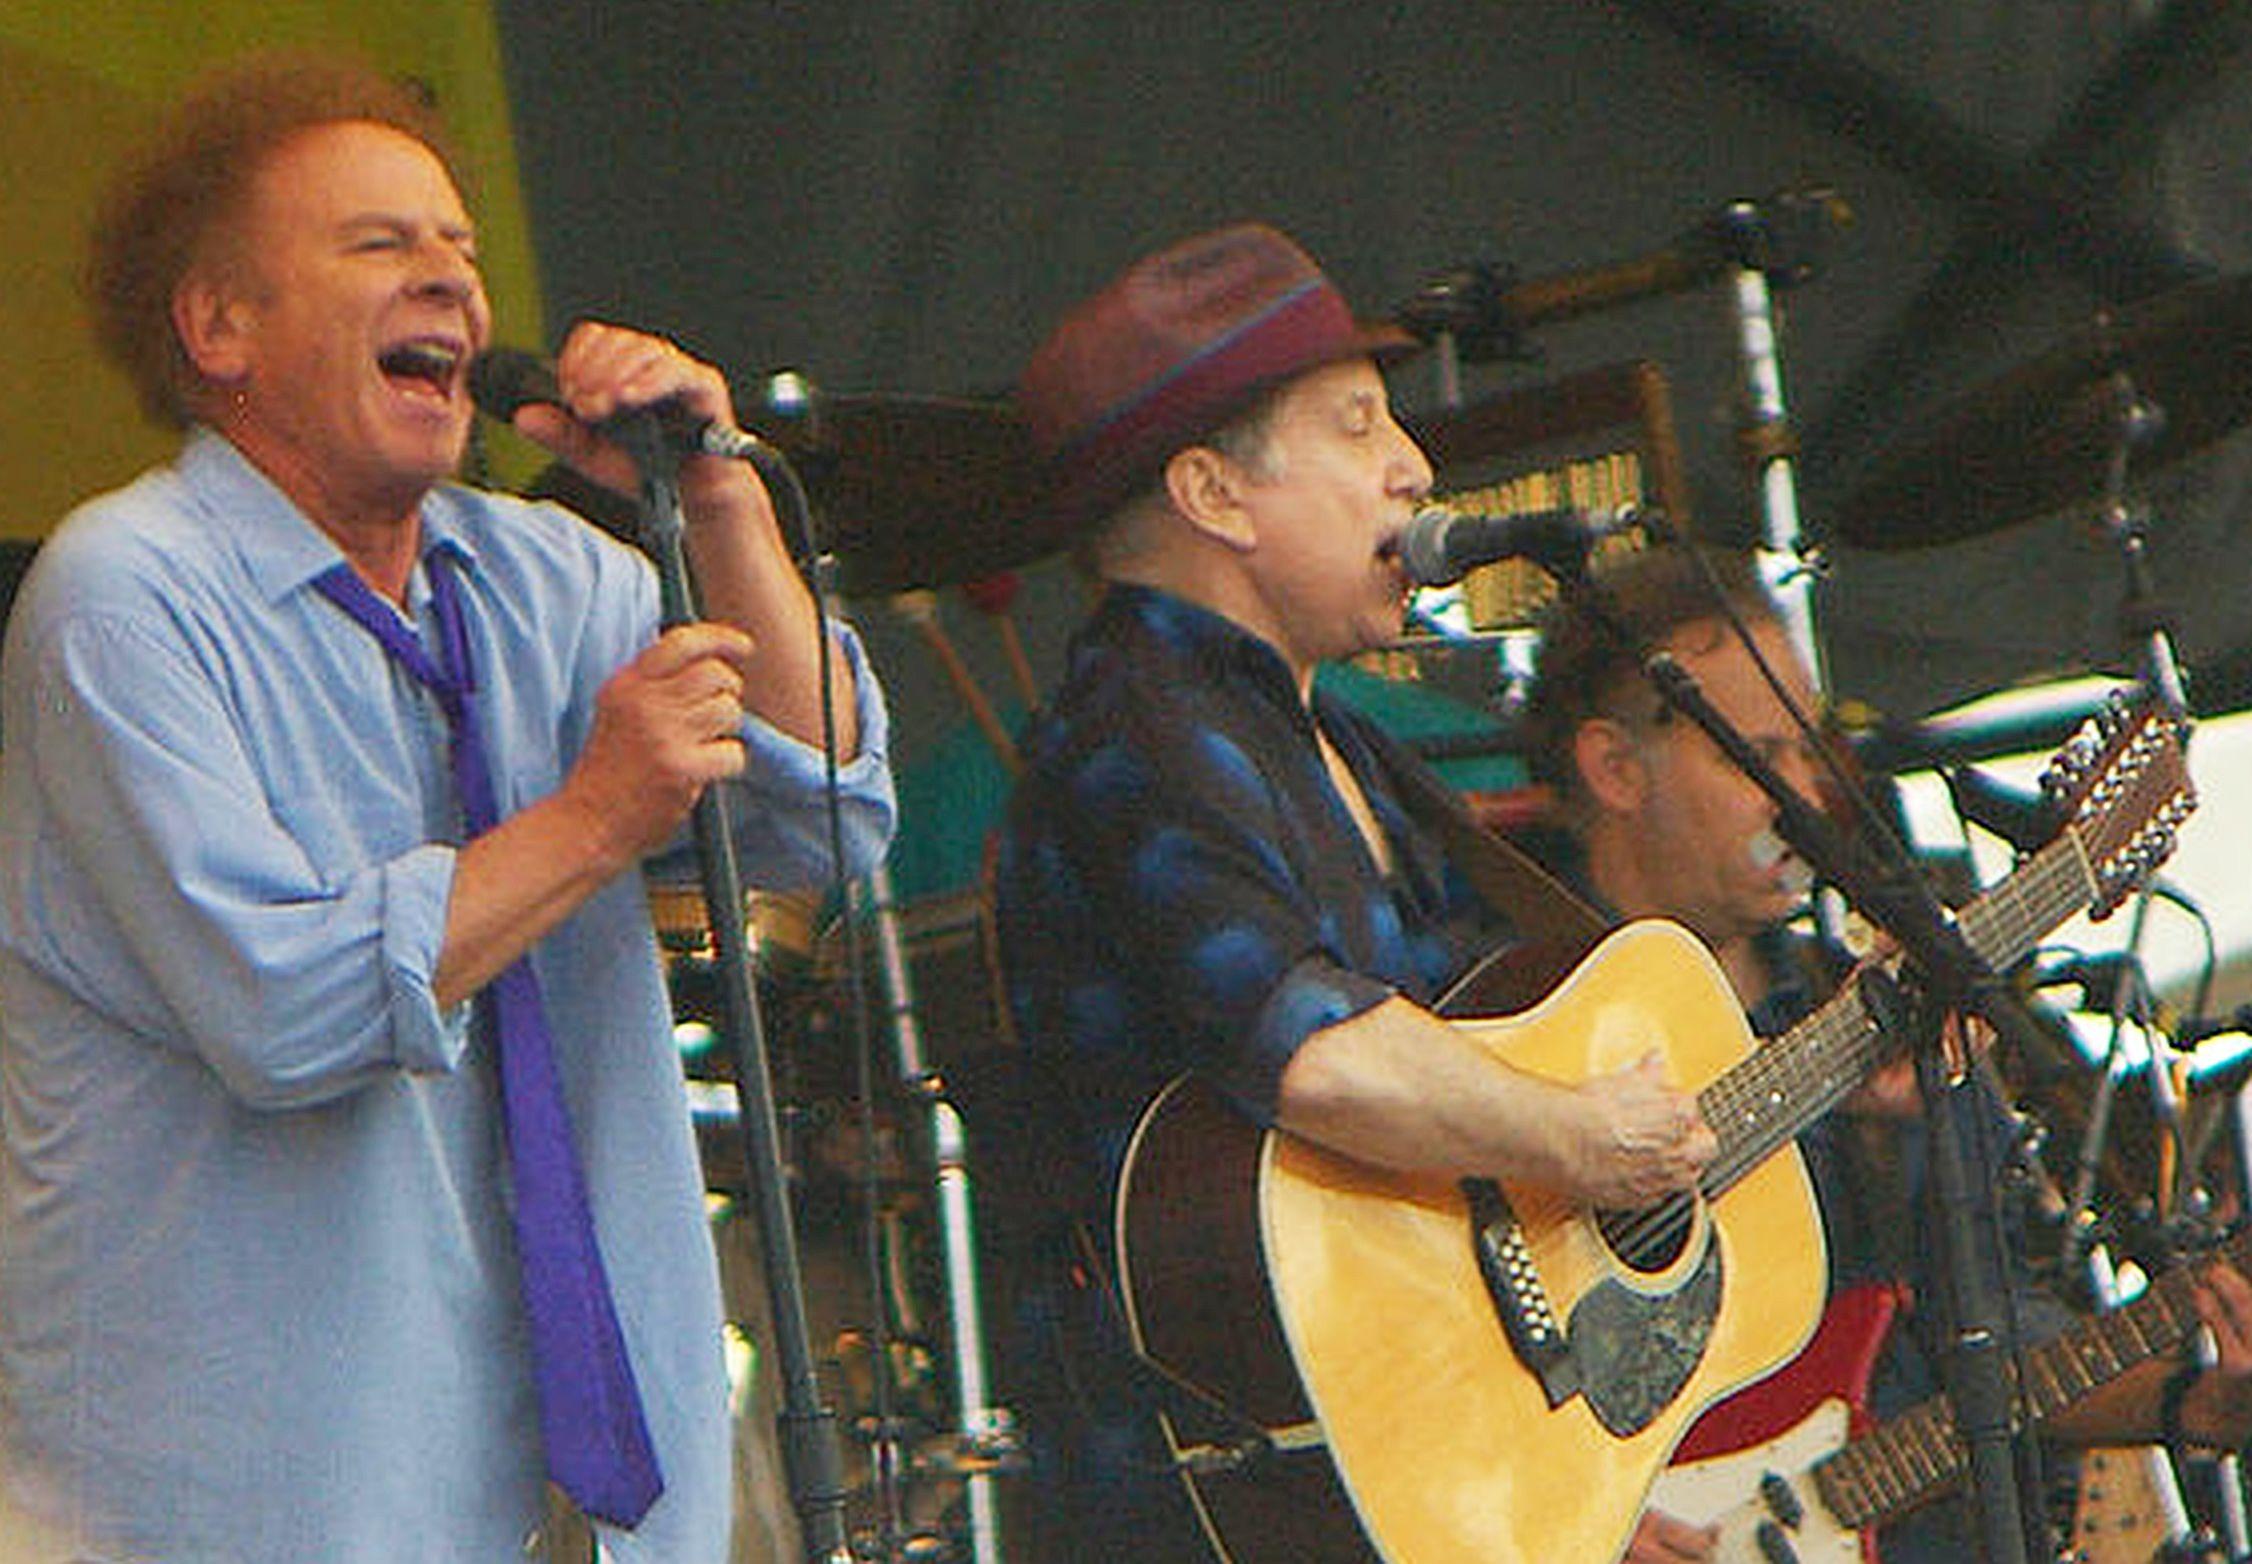 Simon And Garfunkel Tribute Band Tour